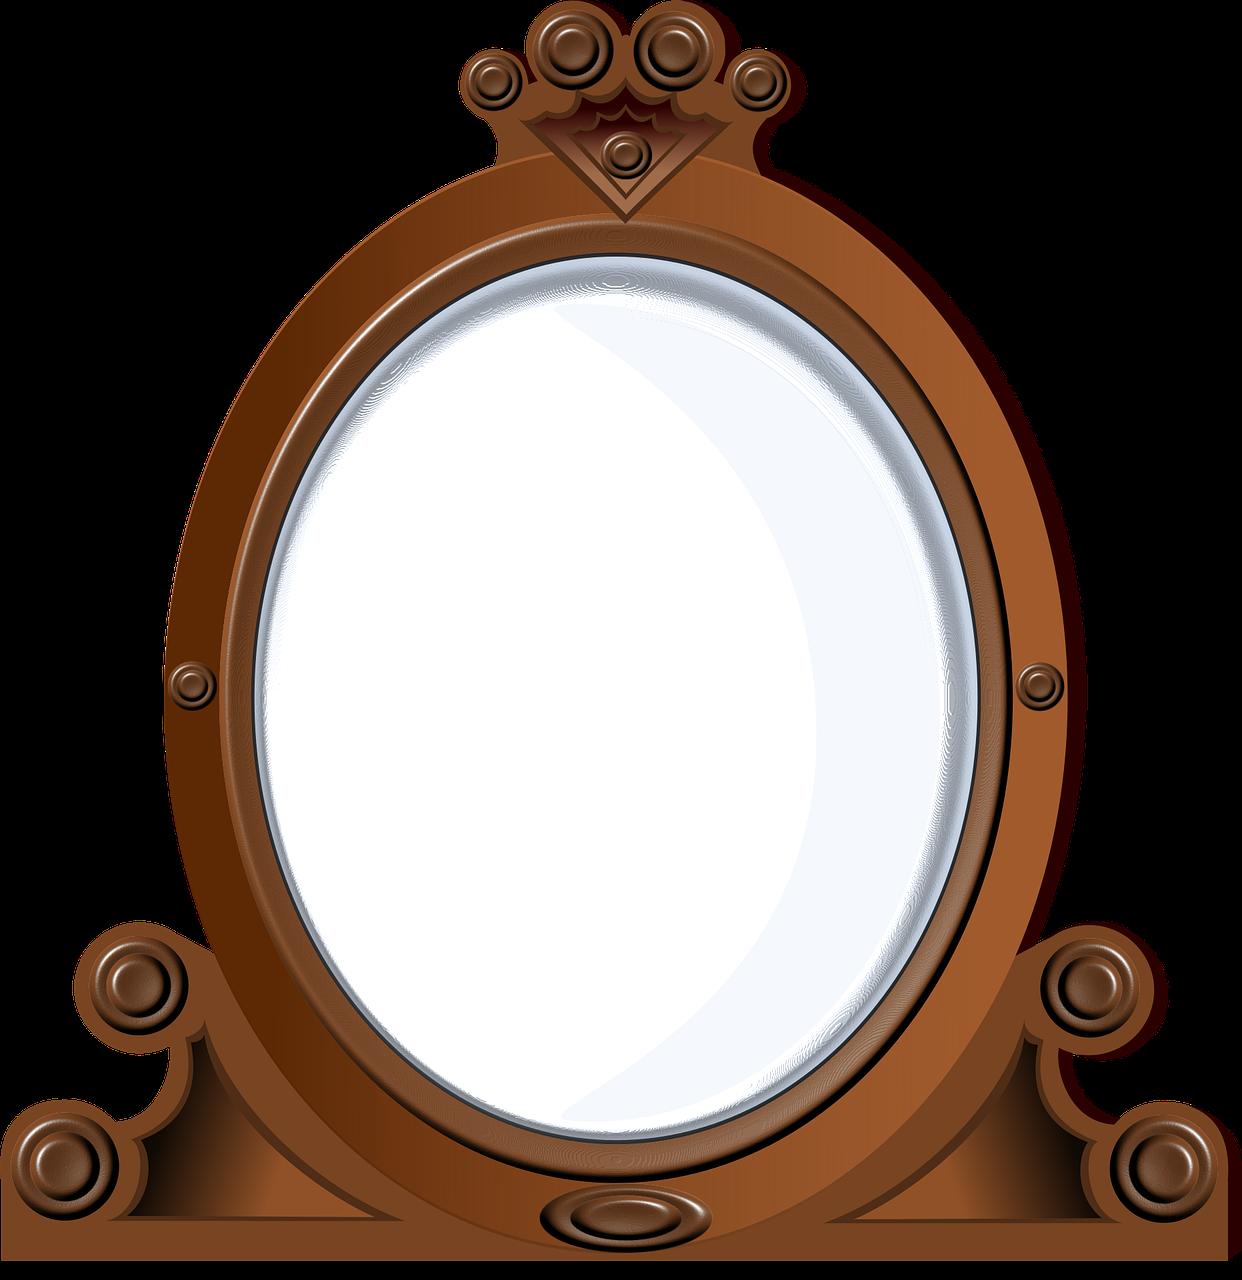 mirror-2109680_1280